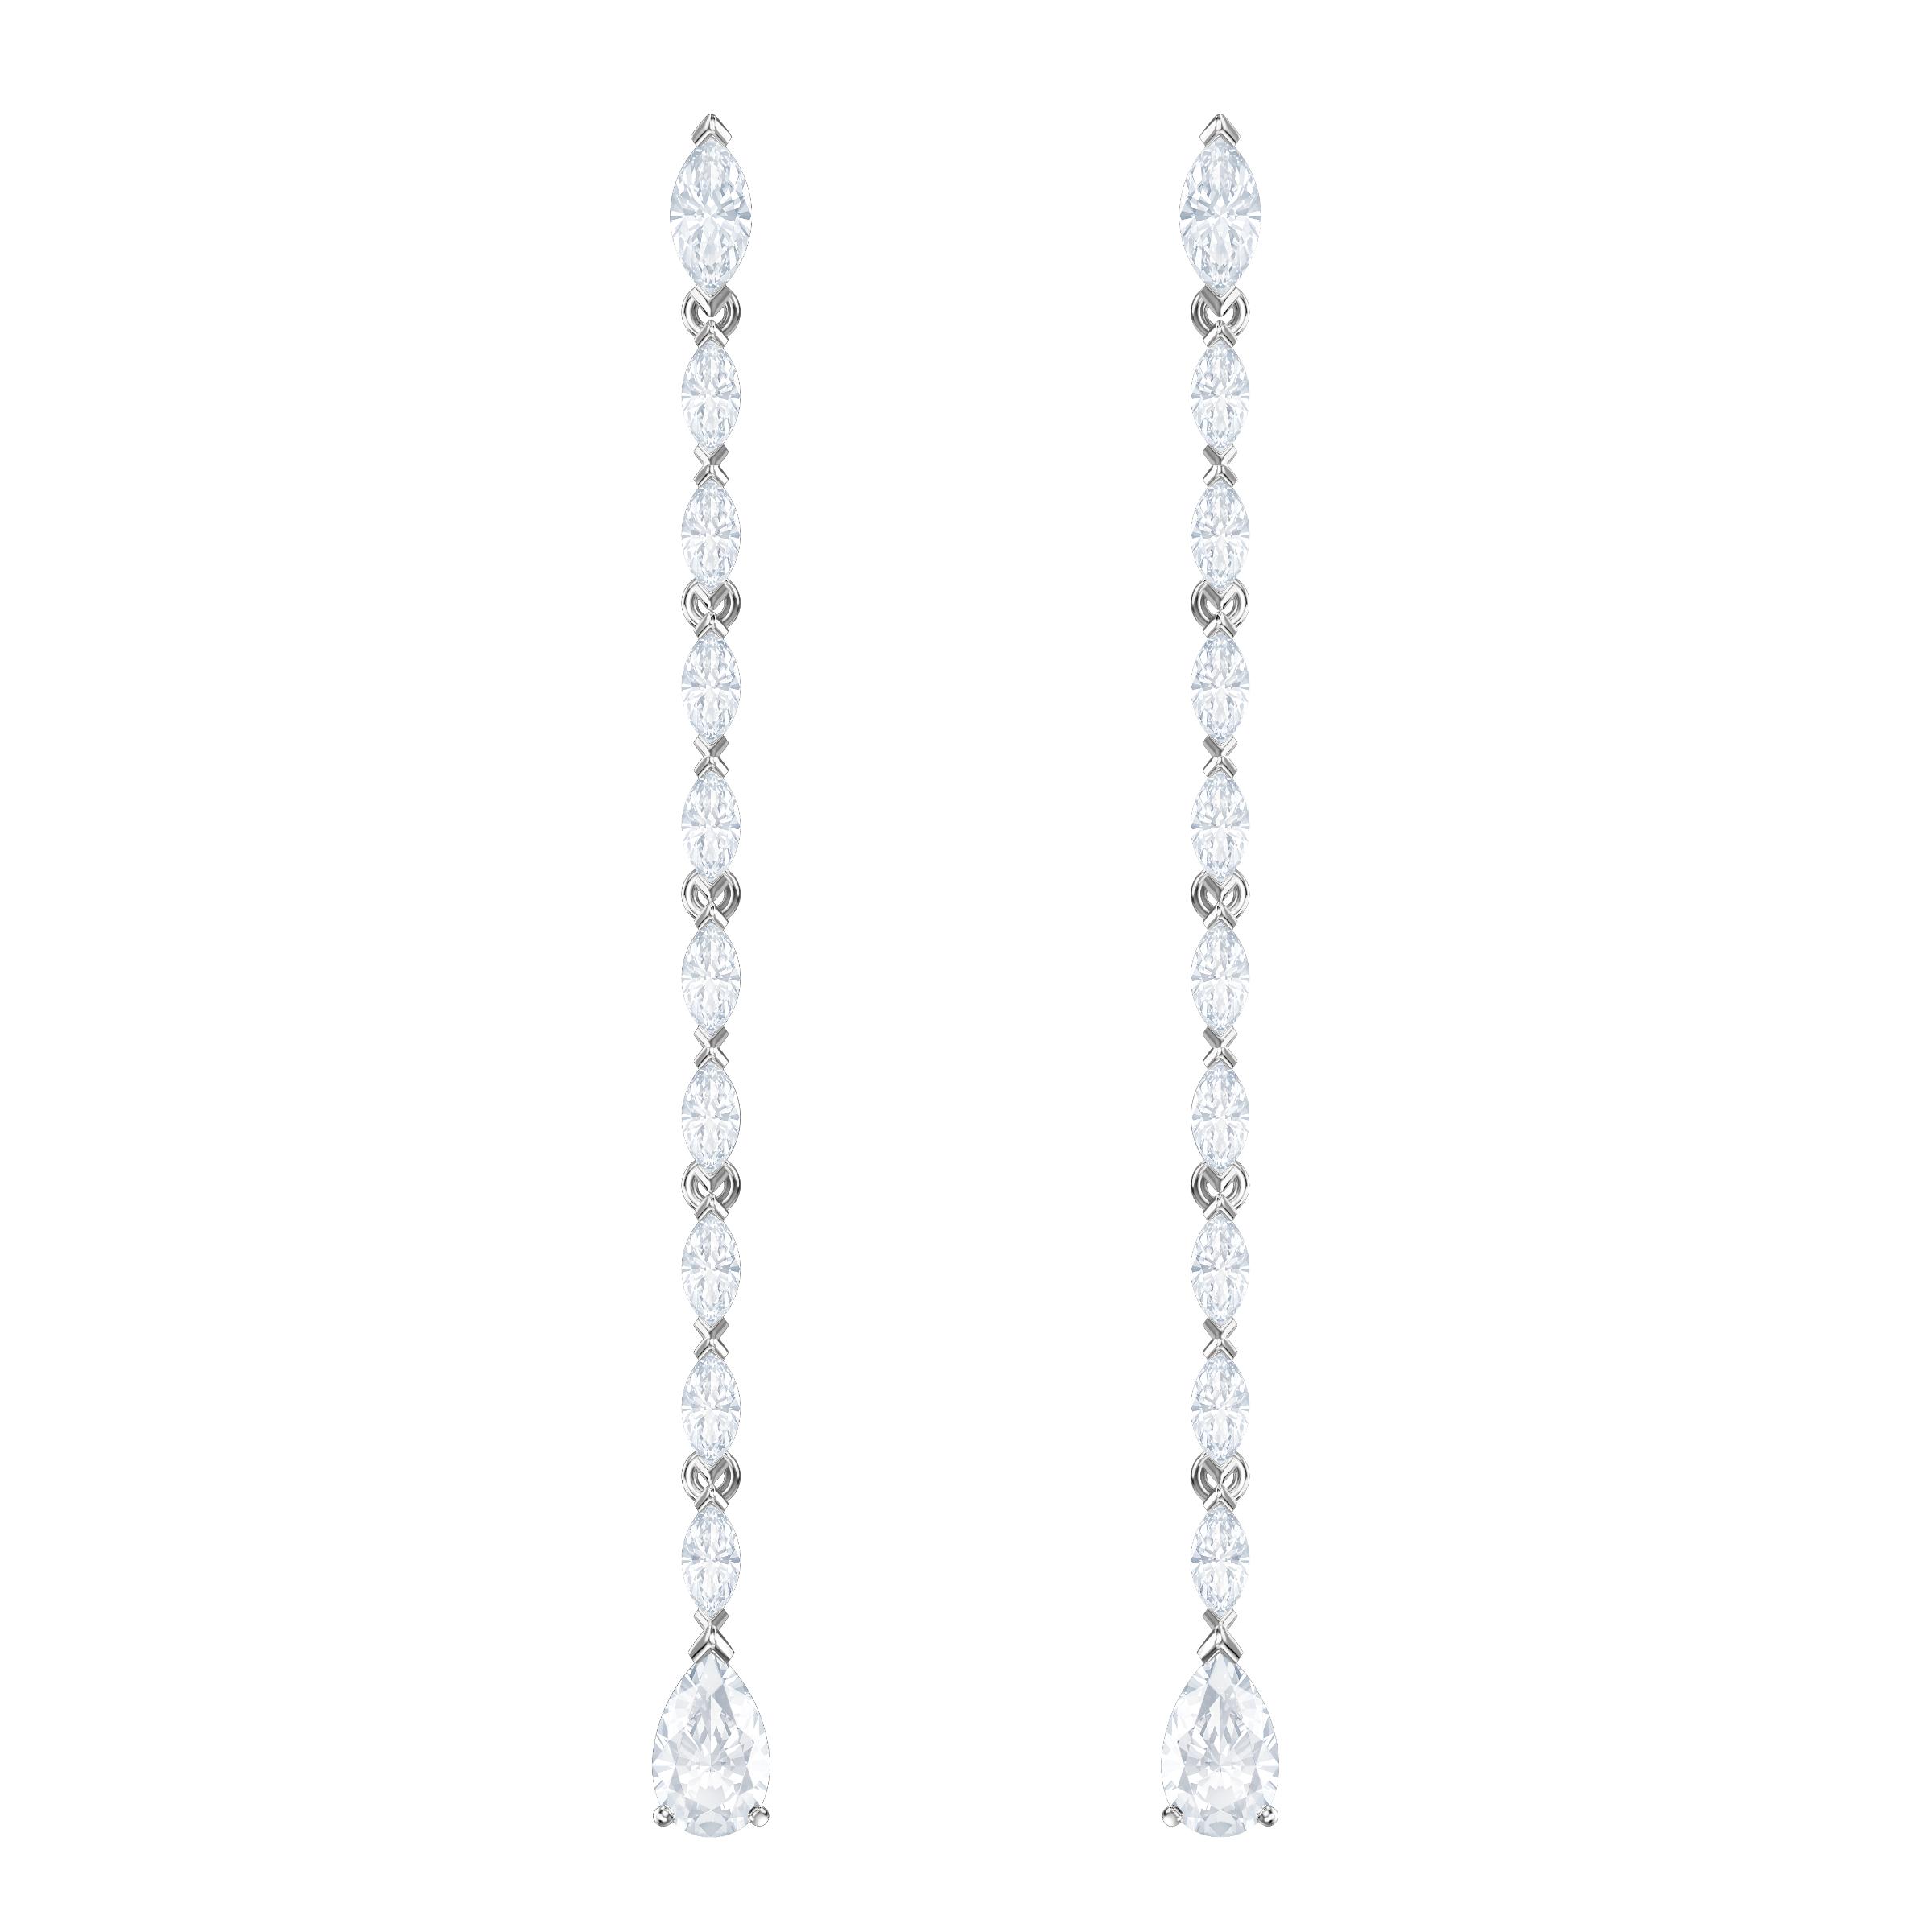 Louison Pierced Earrings, Long, White, Rhodium Plating